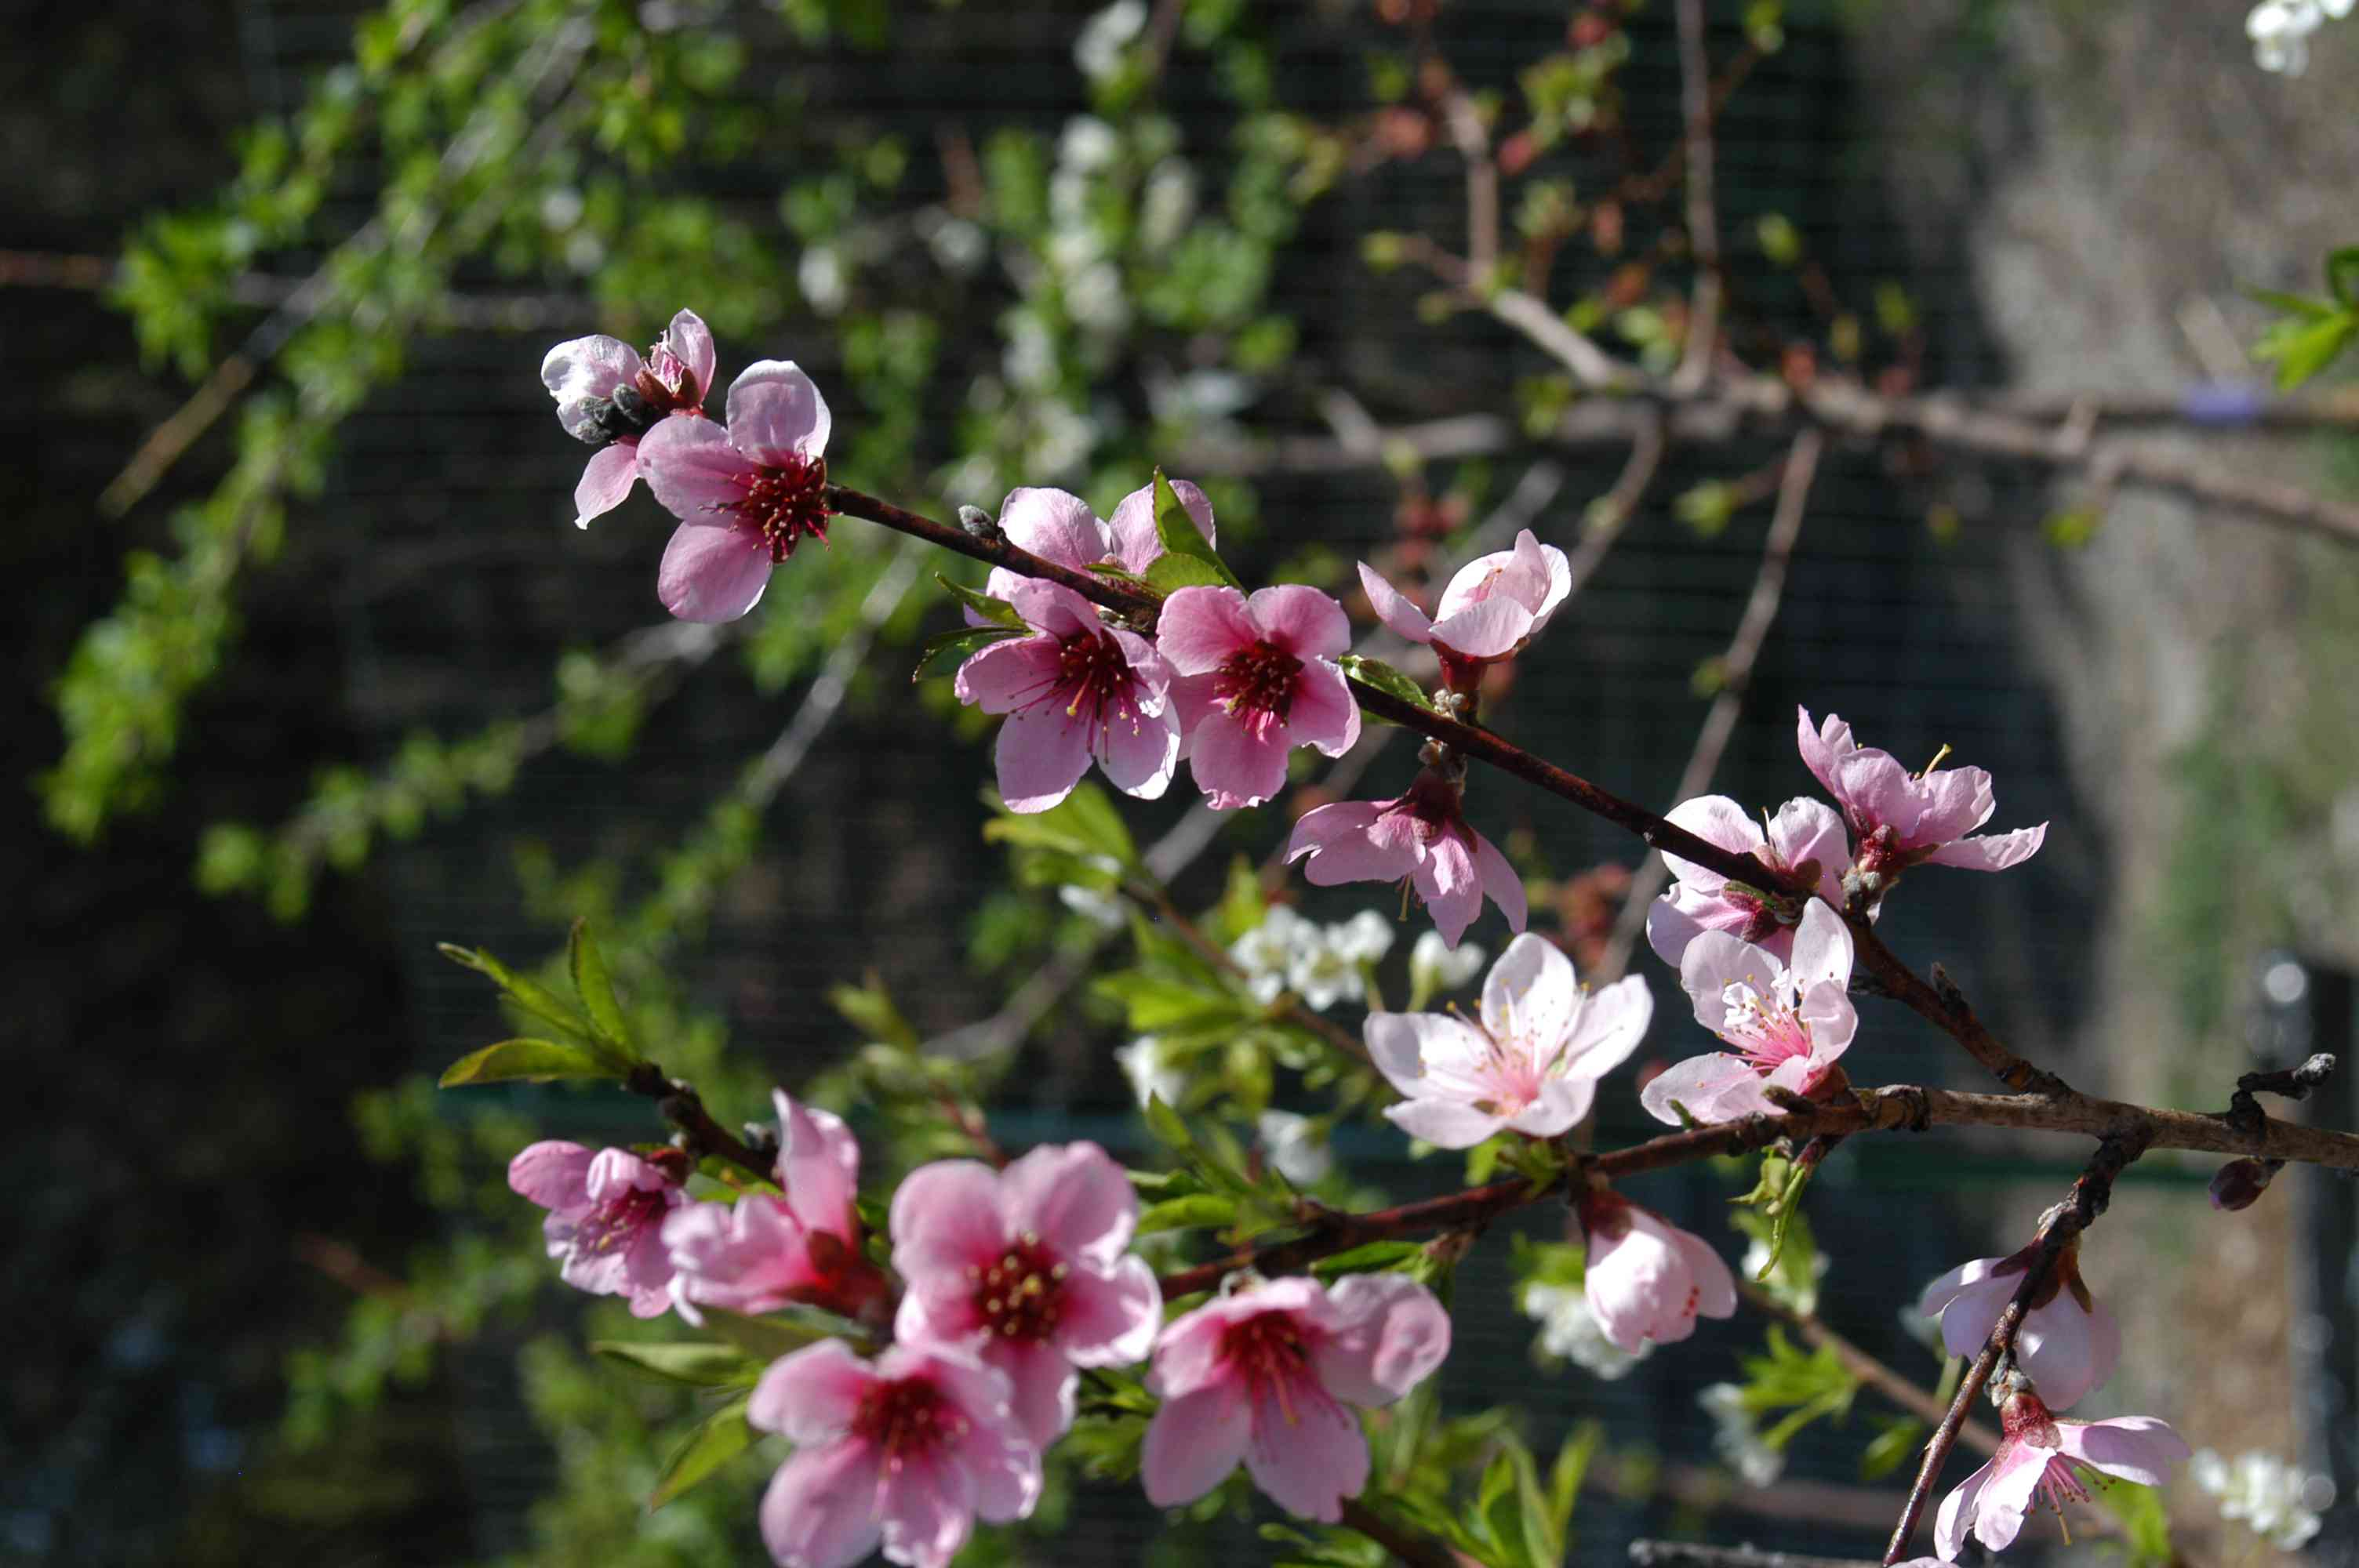 fruit tree blossom flowers